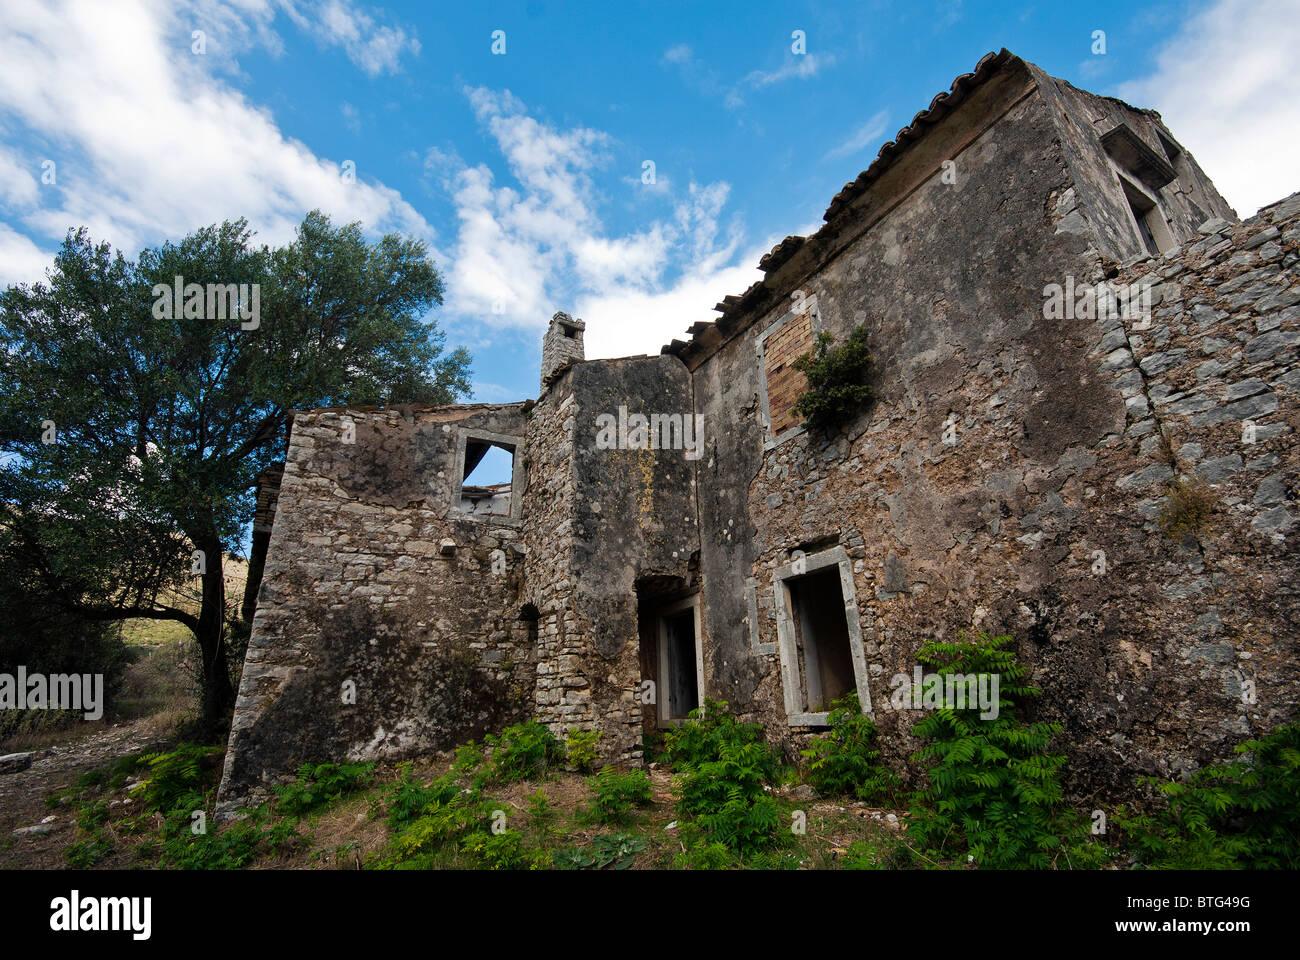 Derelict House in Perithia Village, Corfu, Ionian Islands Greece. - Stock Image